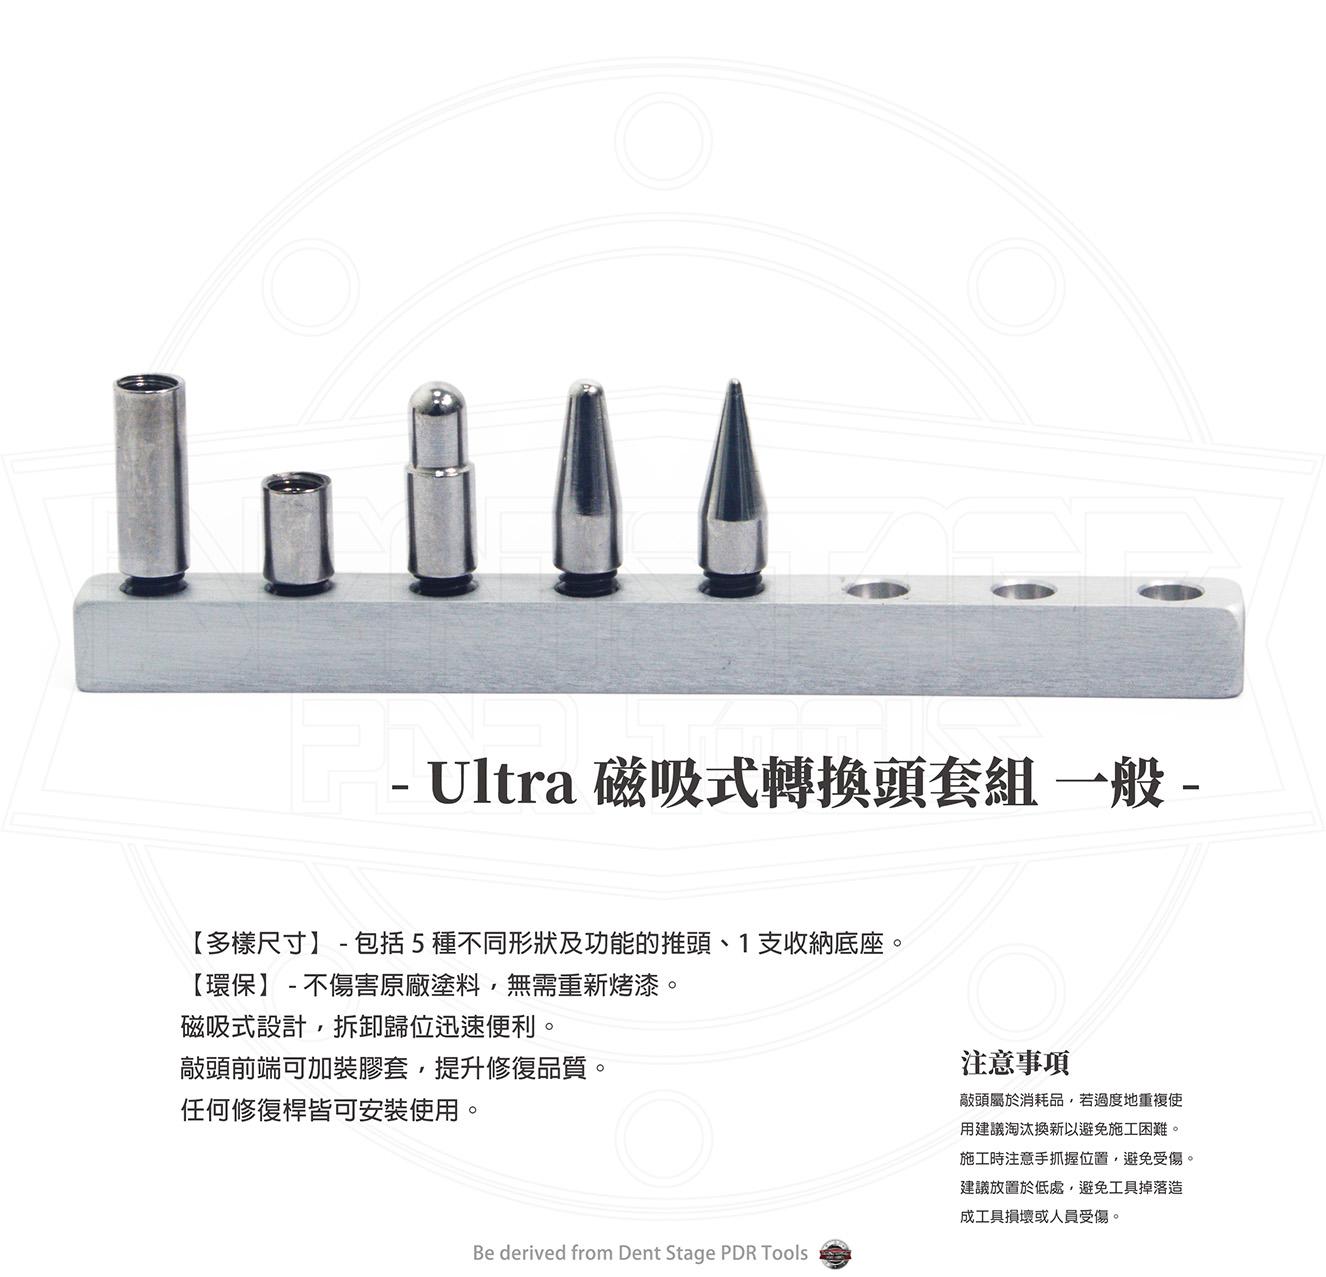 Ultra 磁吸式轉換頭套組 - 0.95管徑_02.jpg